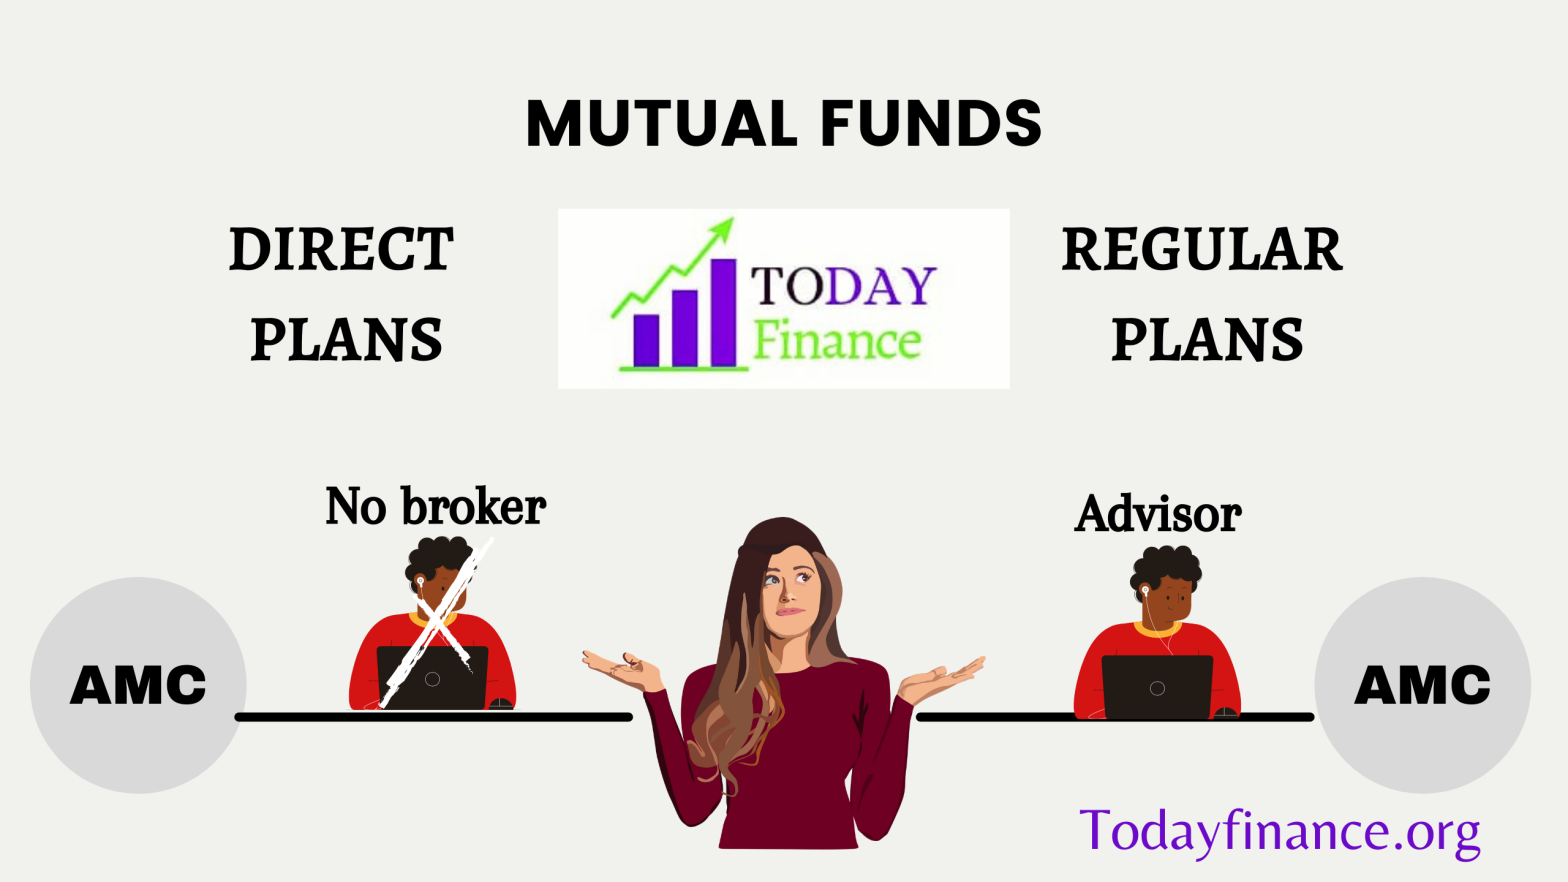 Direct vs Regular Mutual Fund